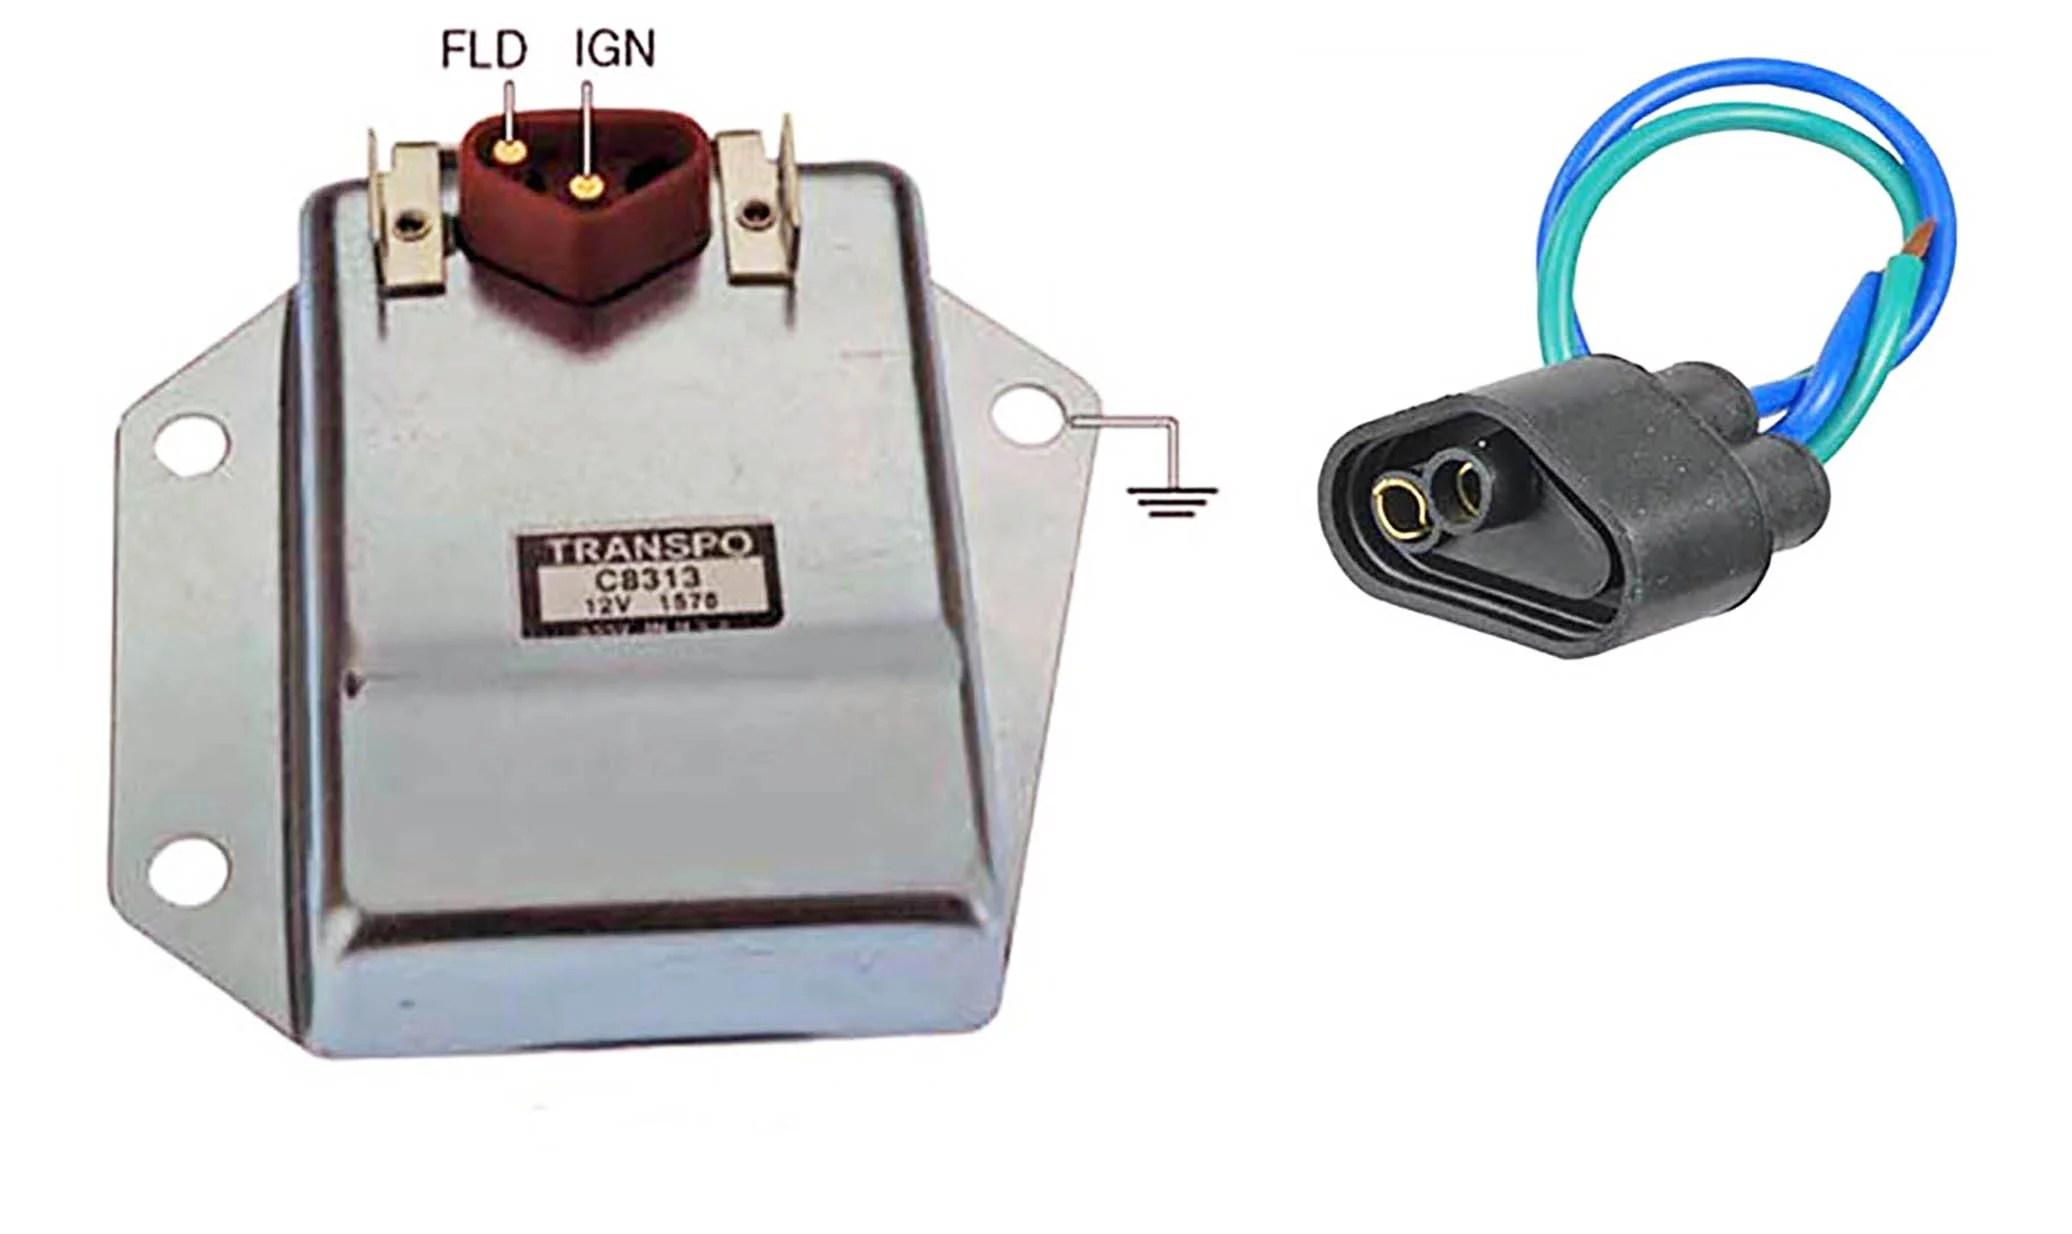 hd external voltage regulator kit with harness chrysler dodge prestolite voltage regulator wiring hd external voltage [ 2072 x 1234 Pixel ]